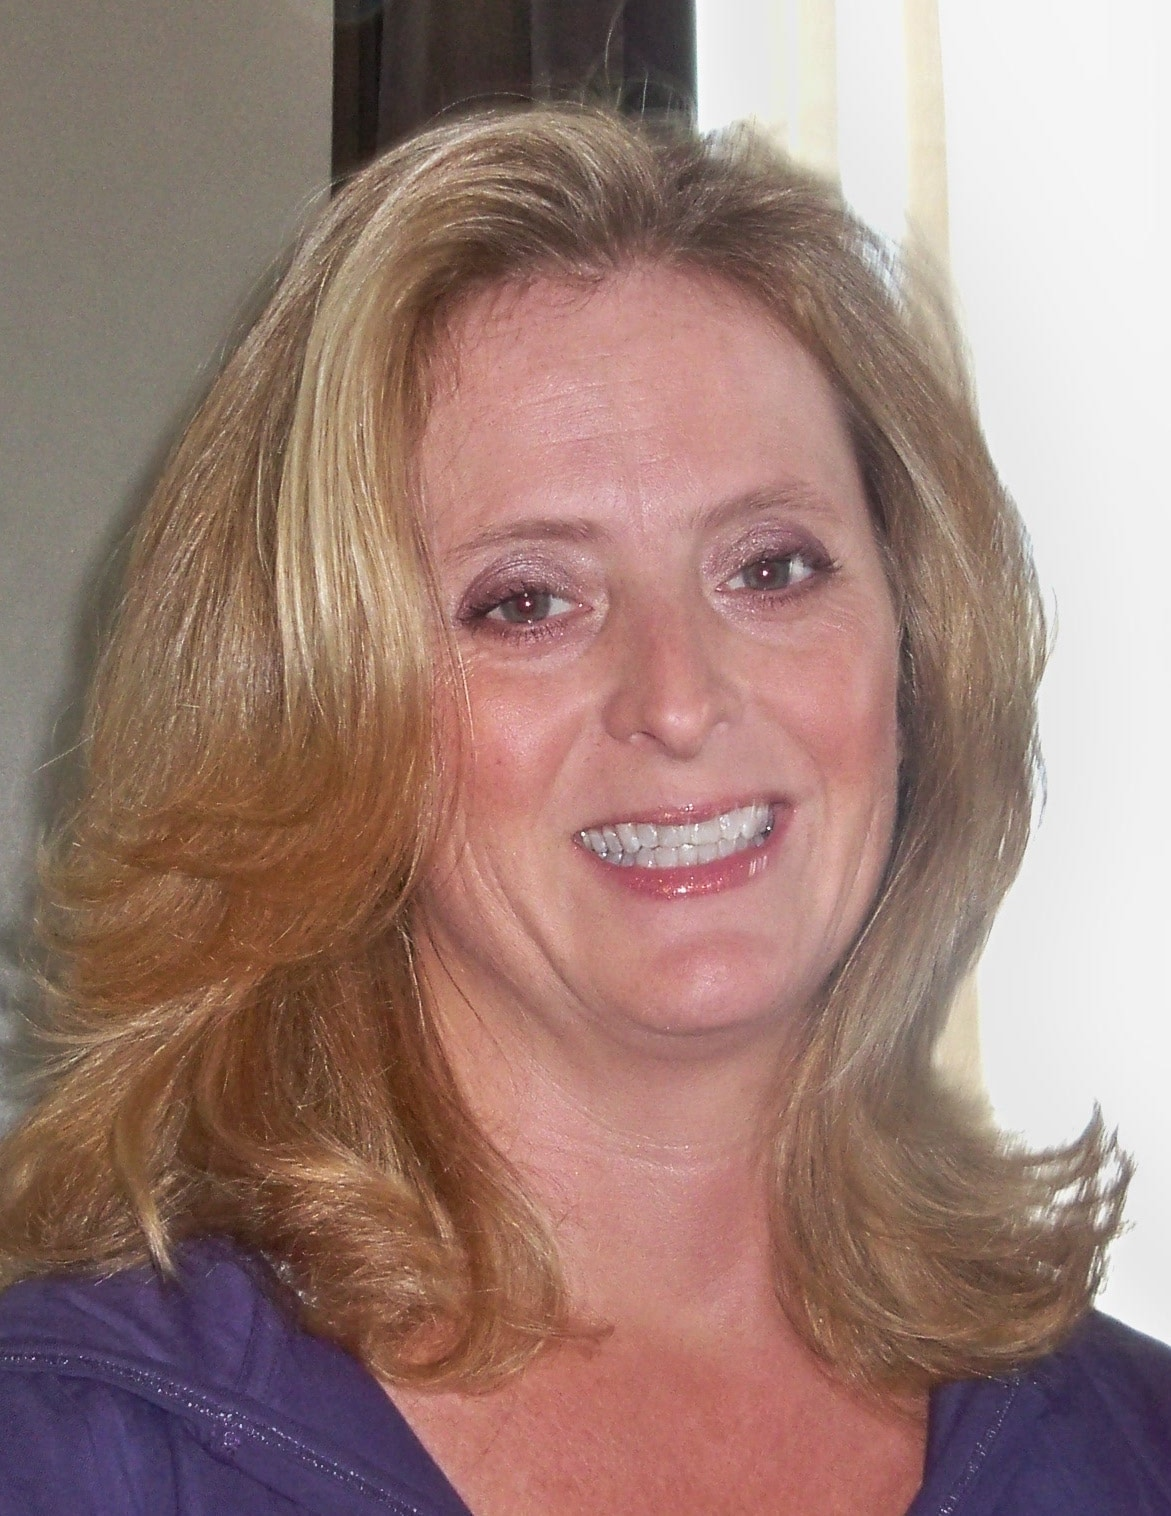 Jennifer From Ocean Isle Beach, NC